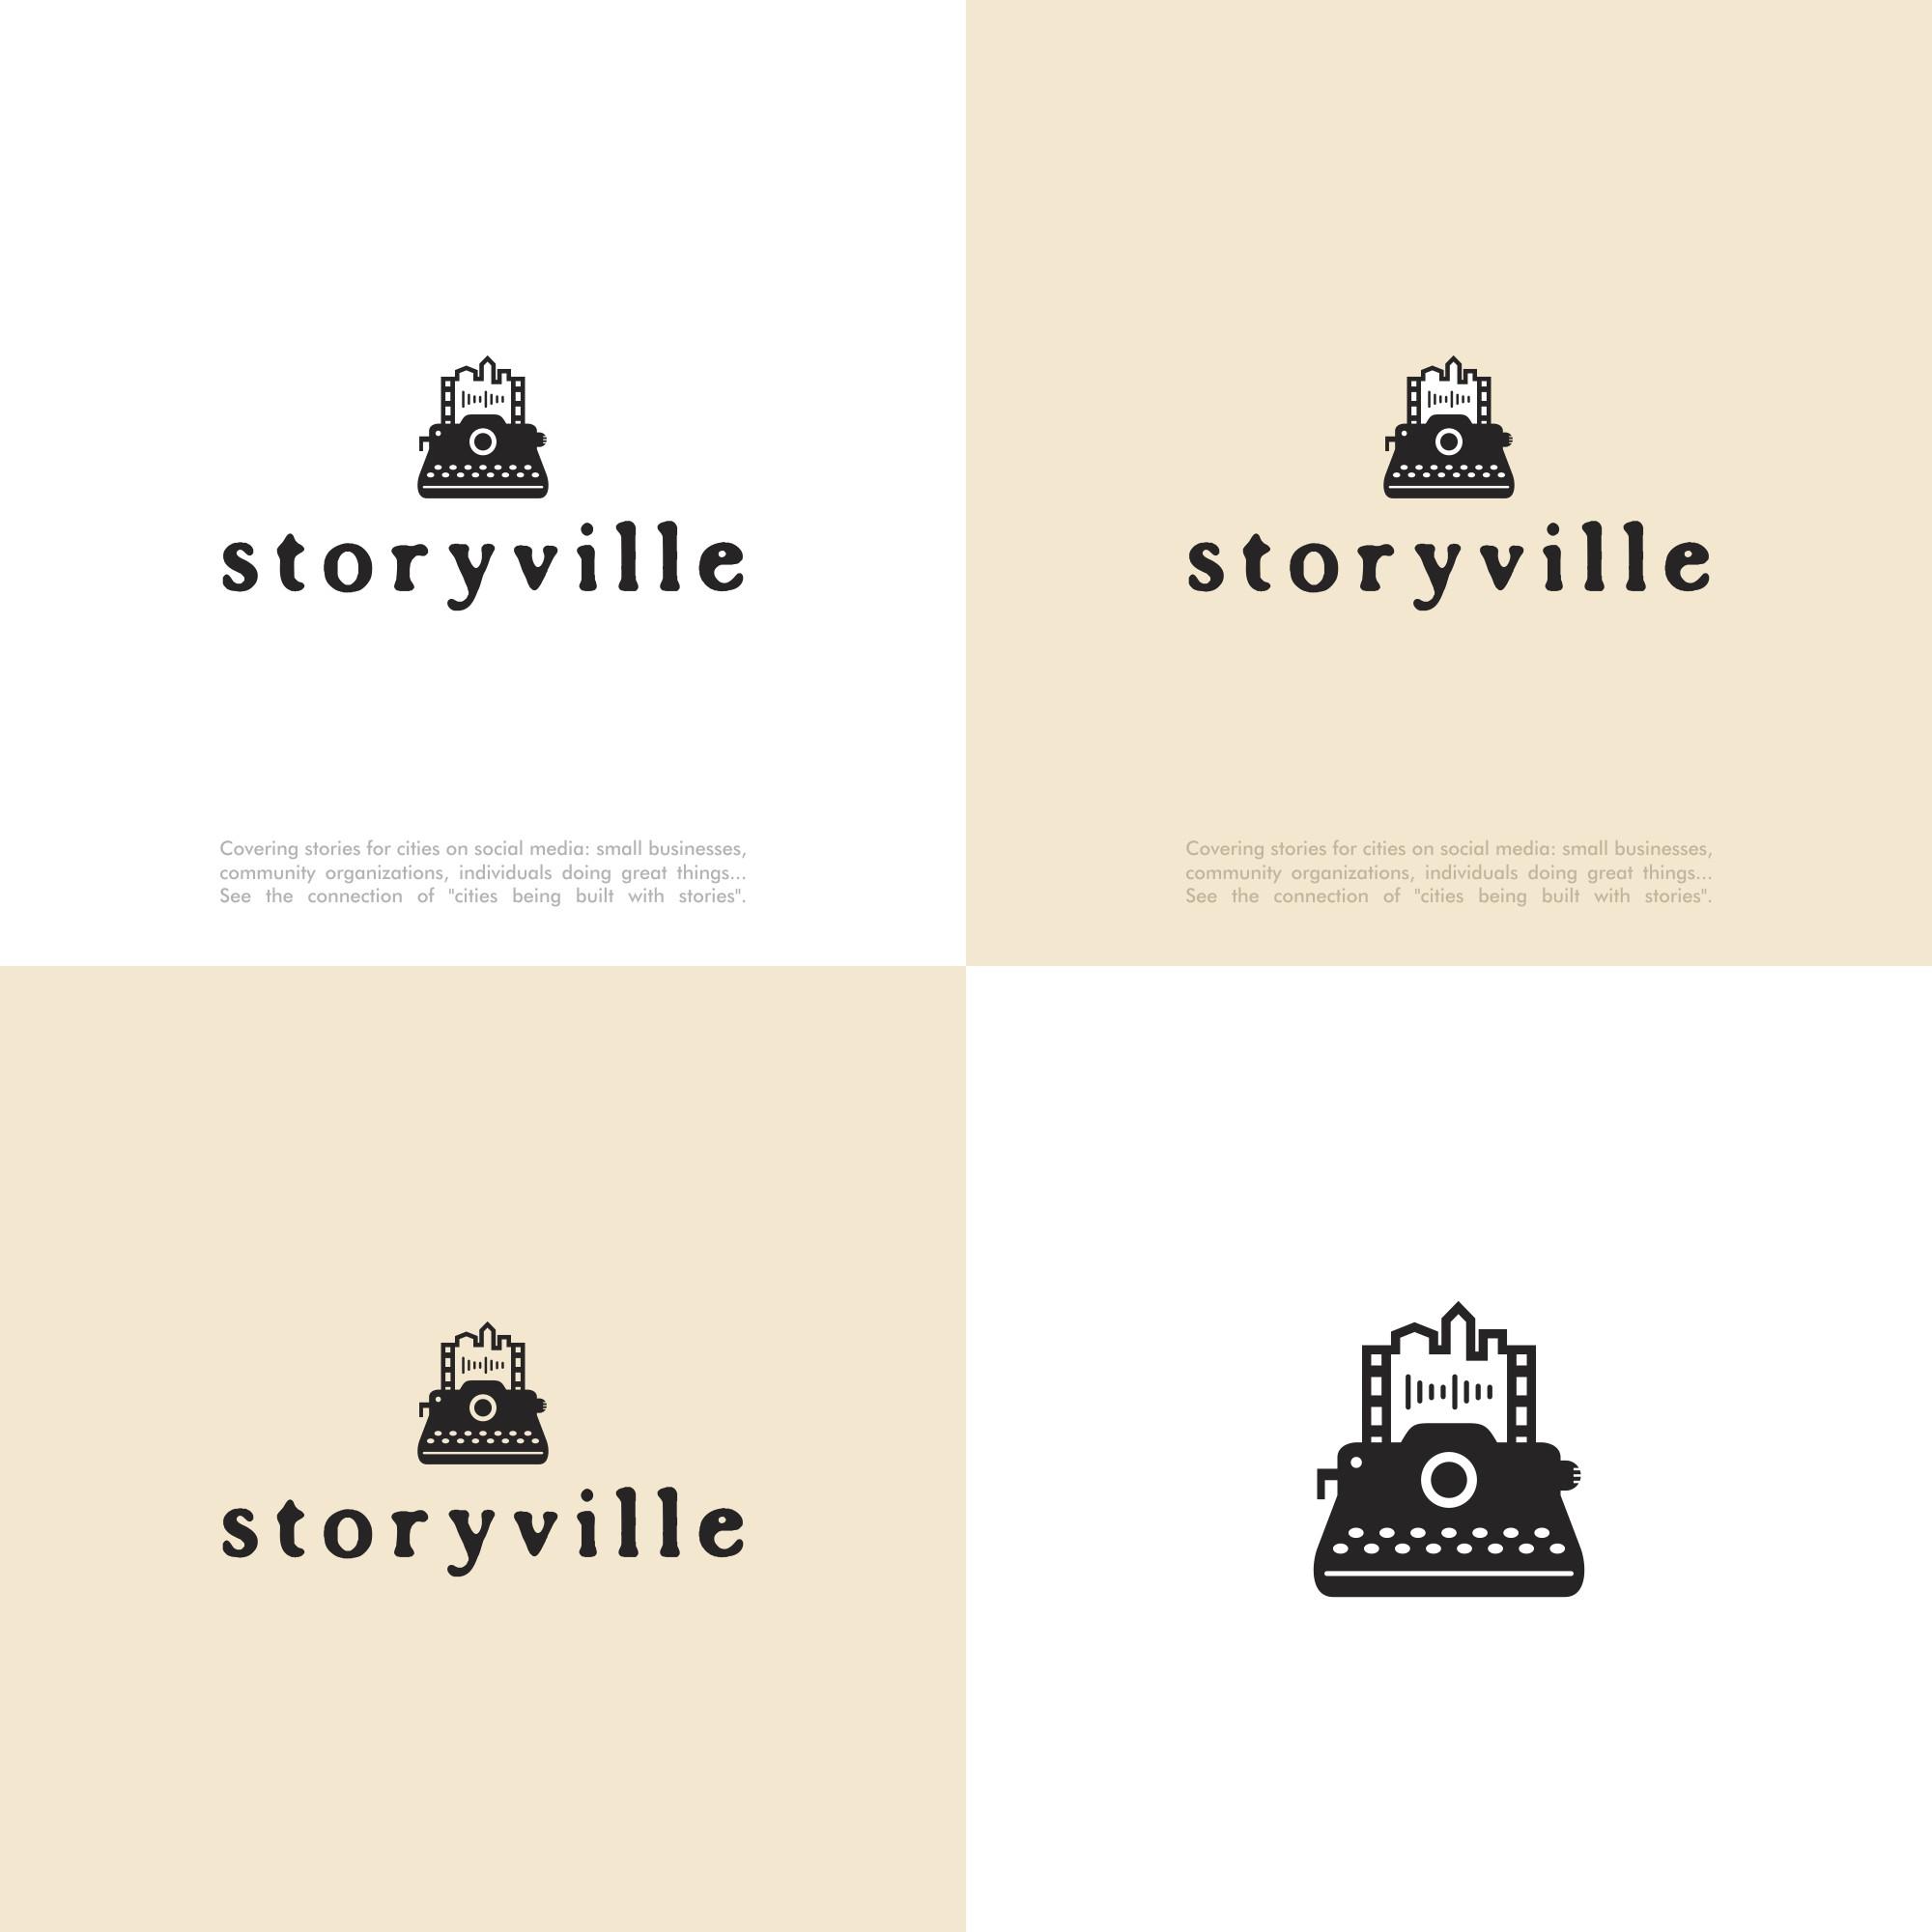 A logo for city-based storytelling